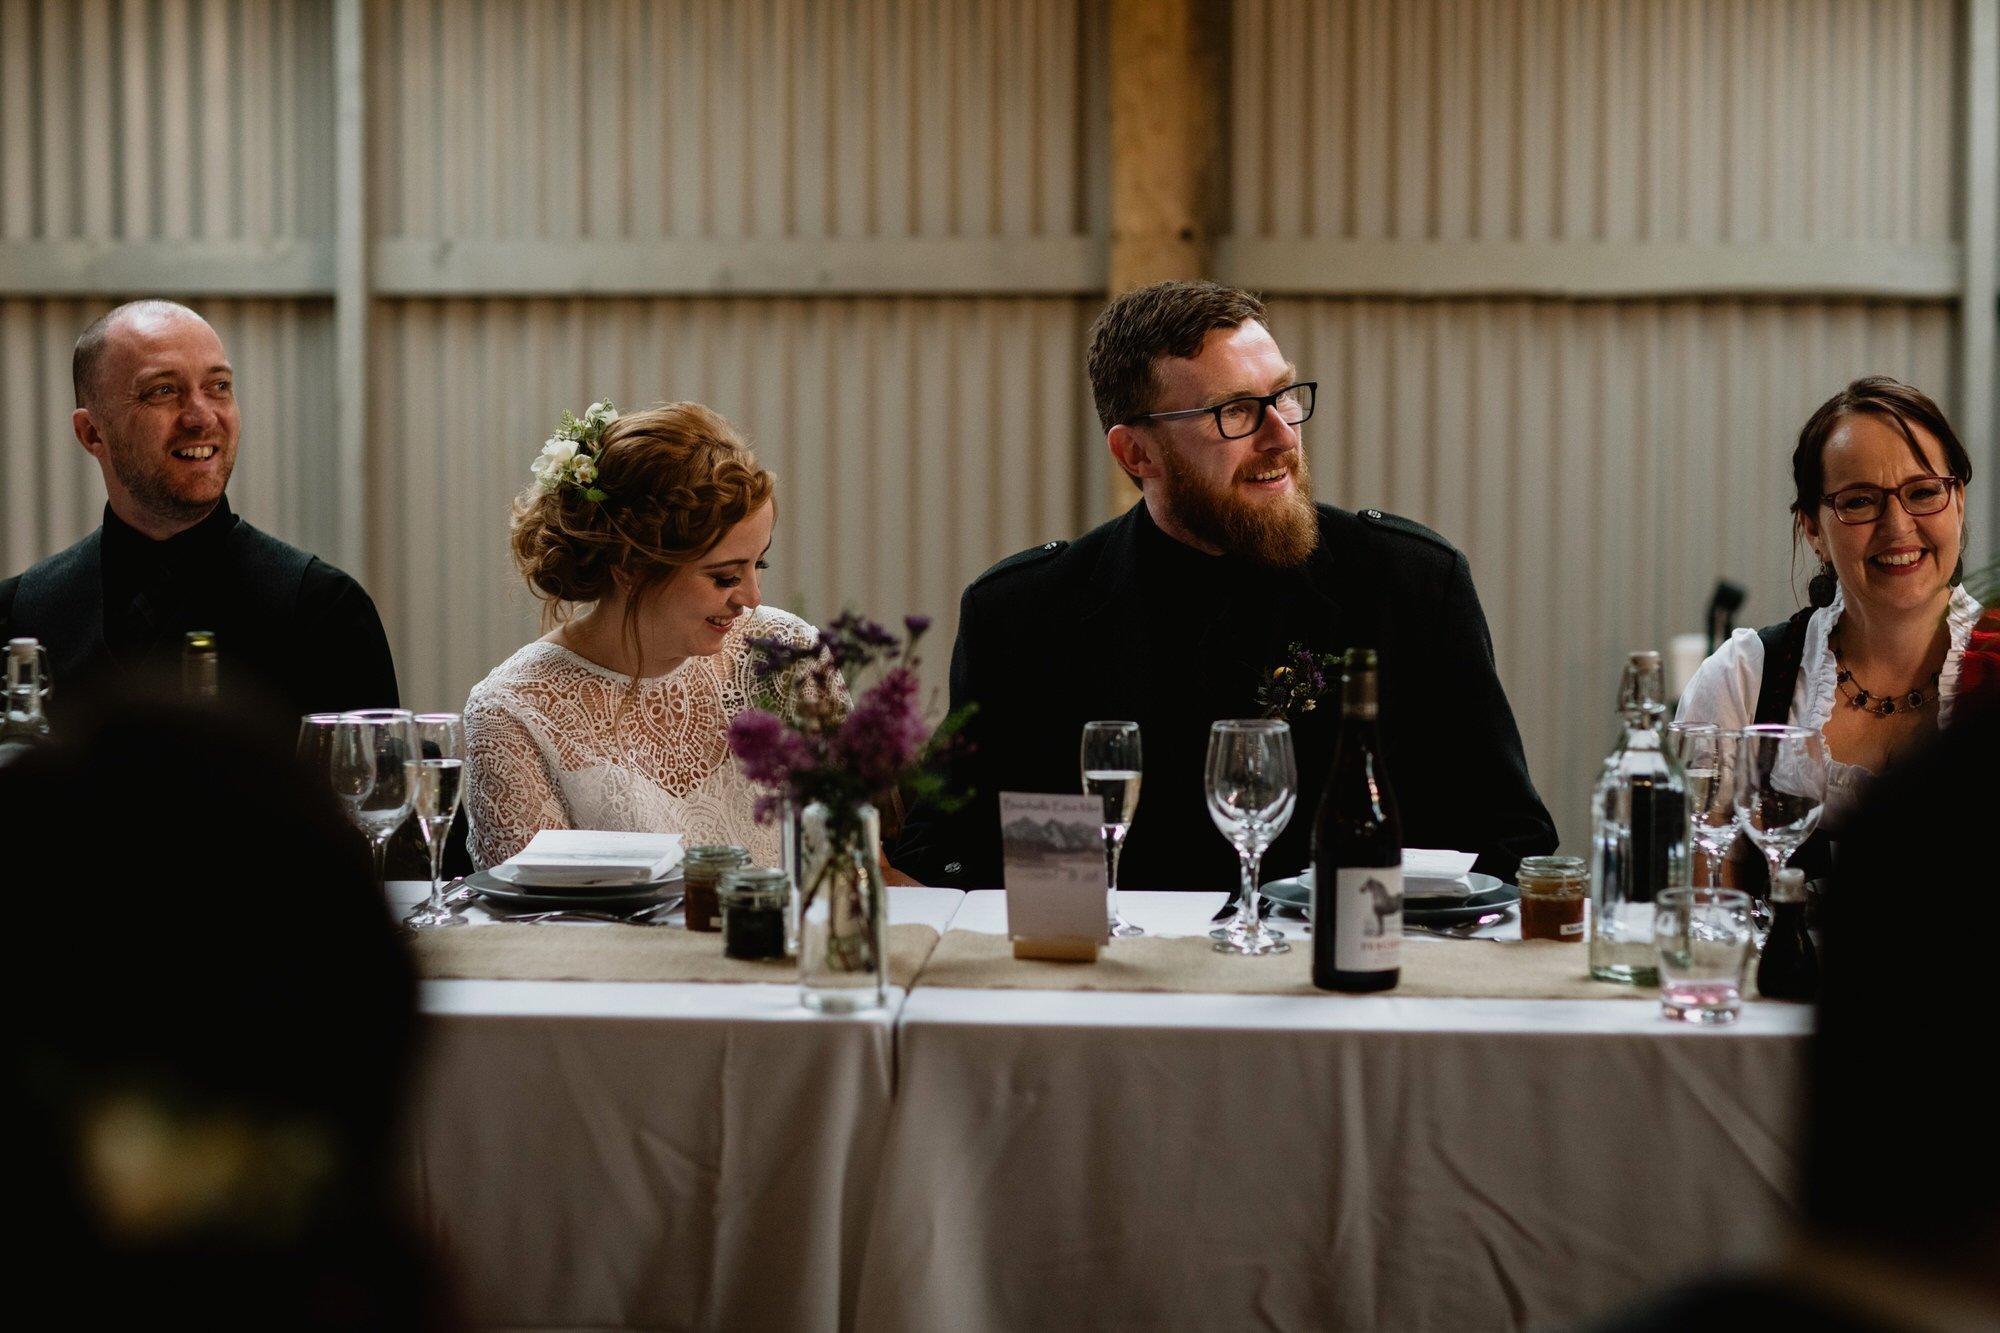 048 TIN SHED KNOCKRAICH WEDDING AUSTRIAN SCOTTISH ZOE ALEXANDRA PHOTOGRAPHY